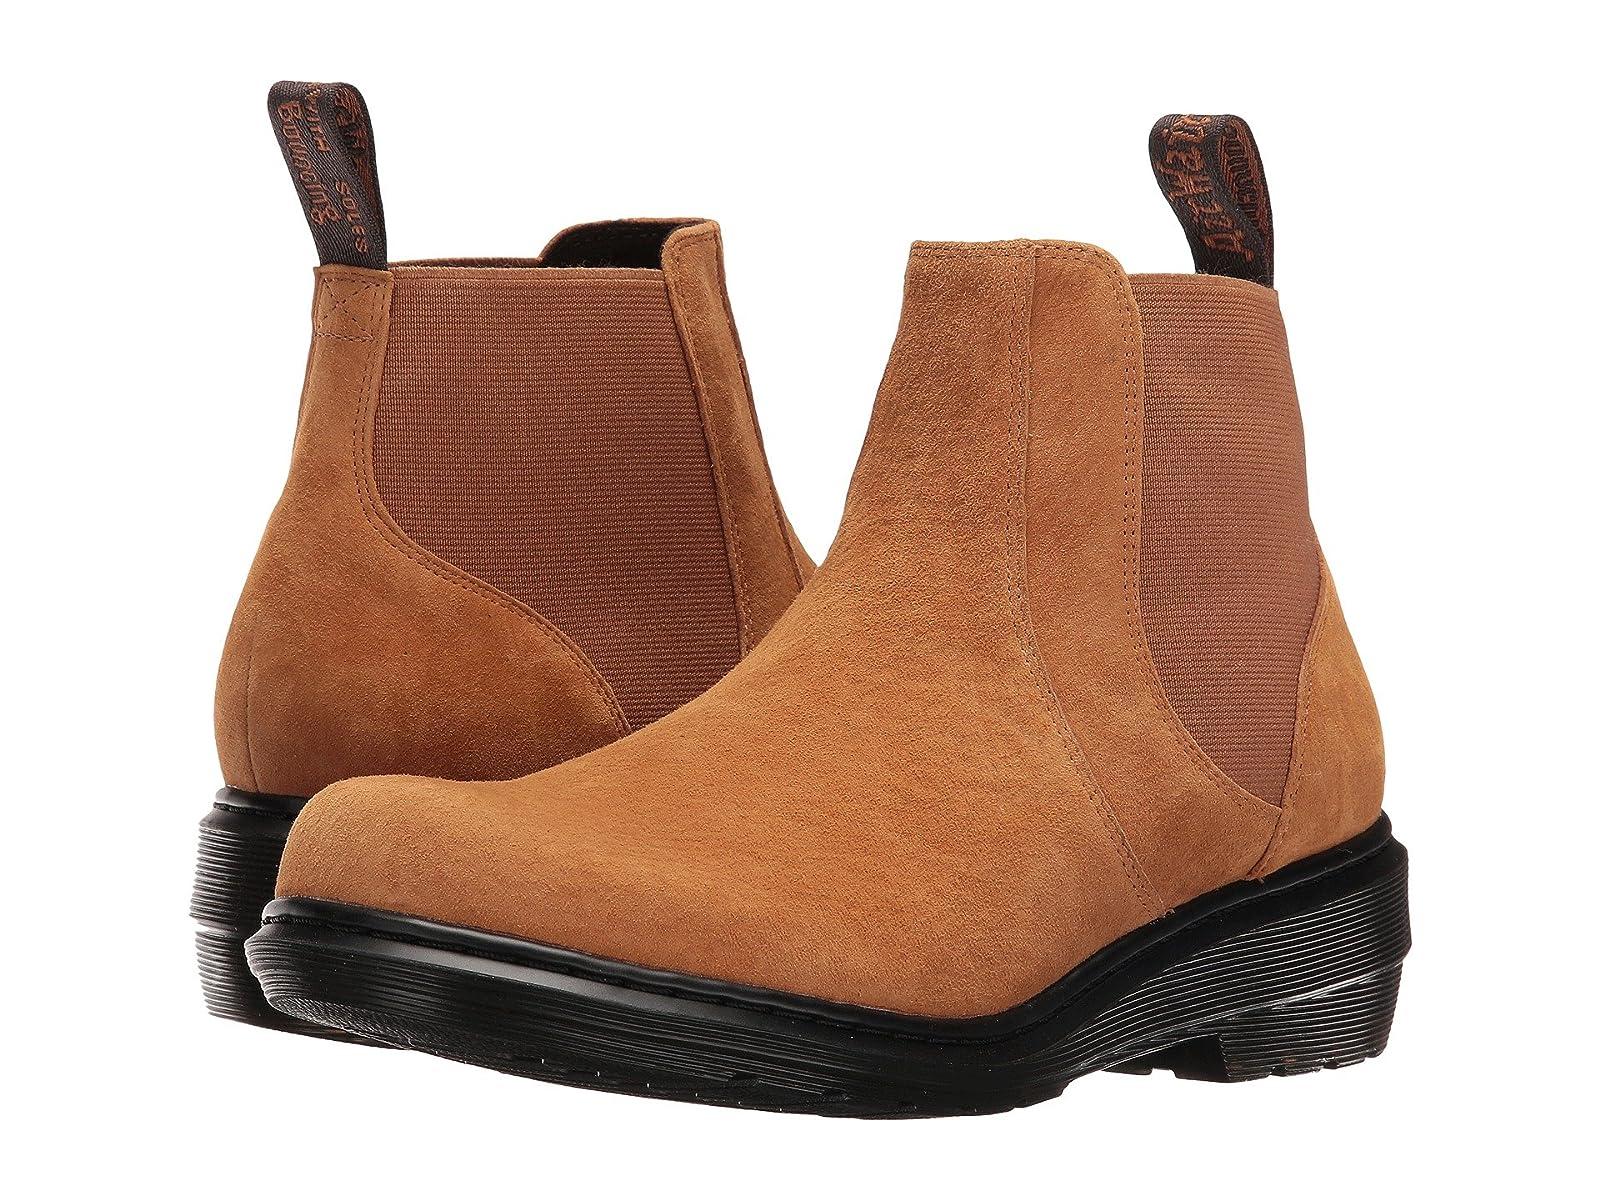 Dr. Martens Pamela Chelsea BootCheap and distinctive eye-catching shoes